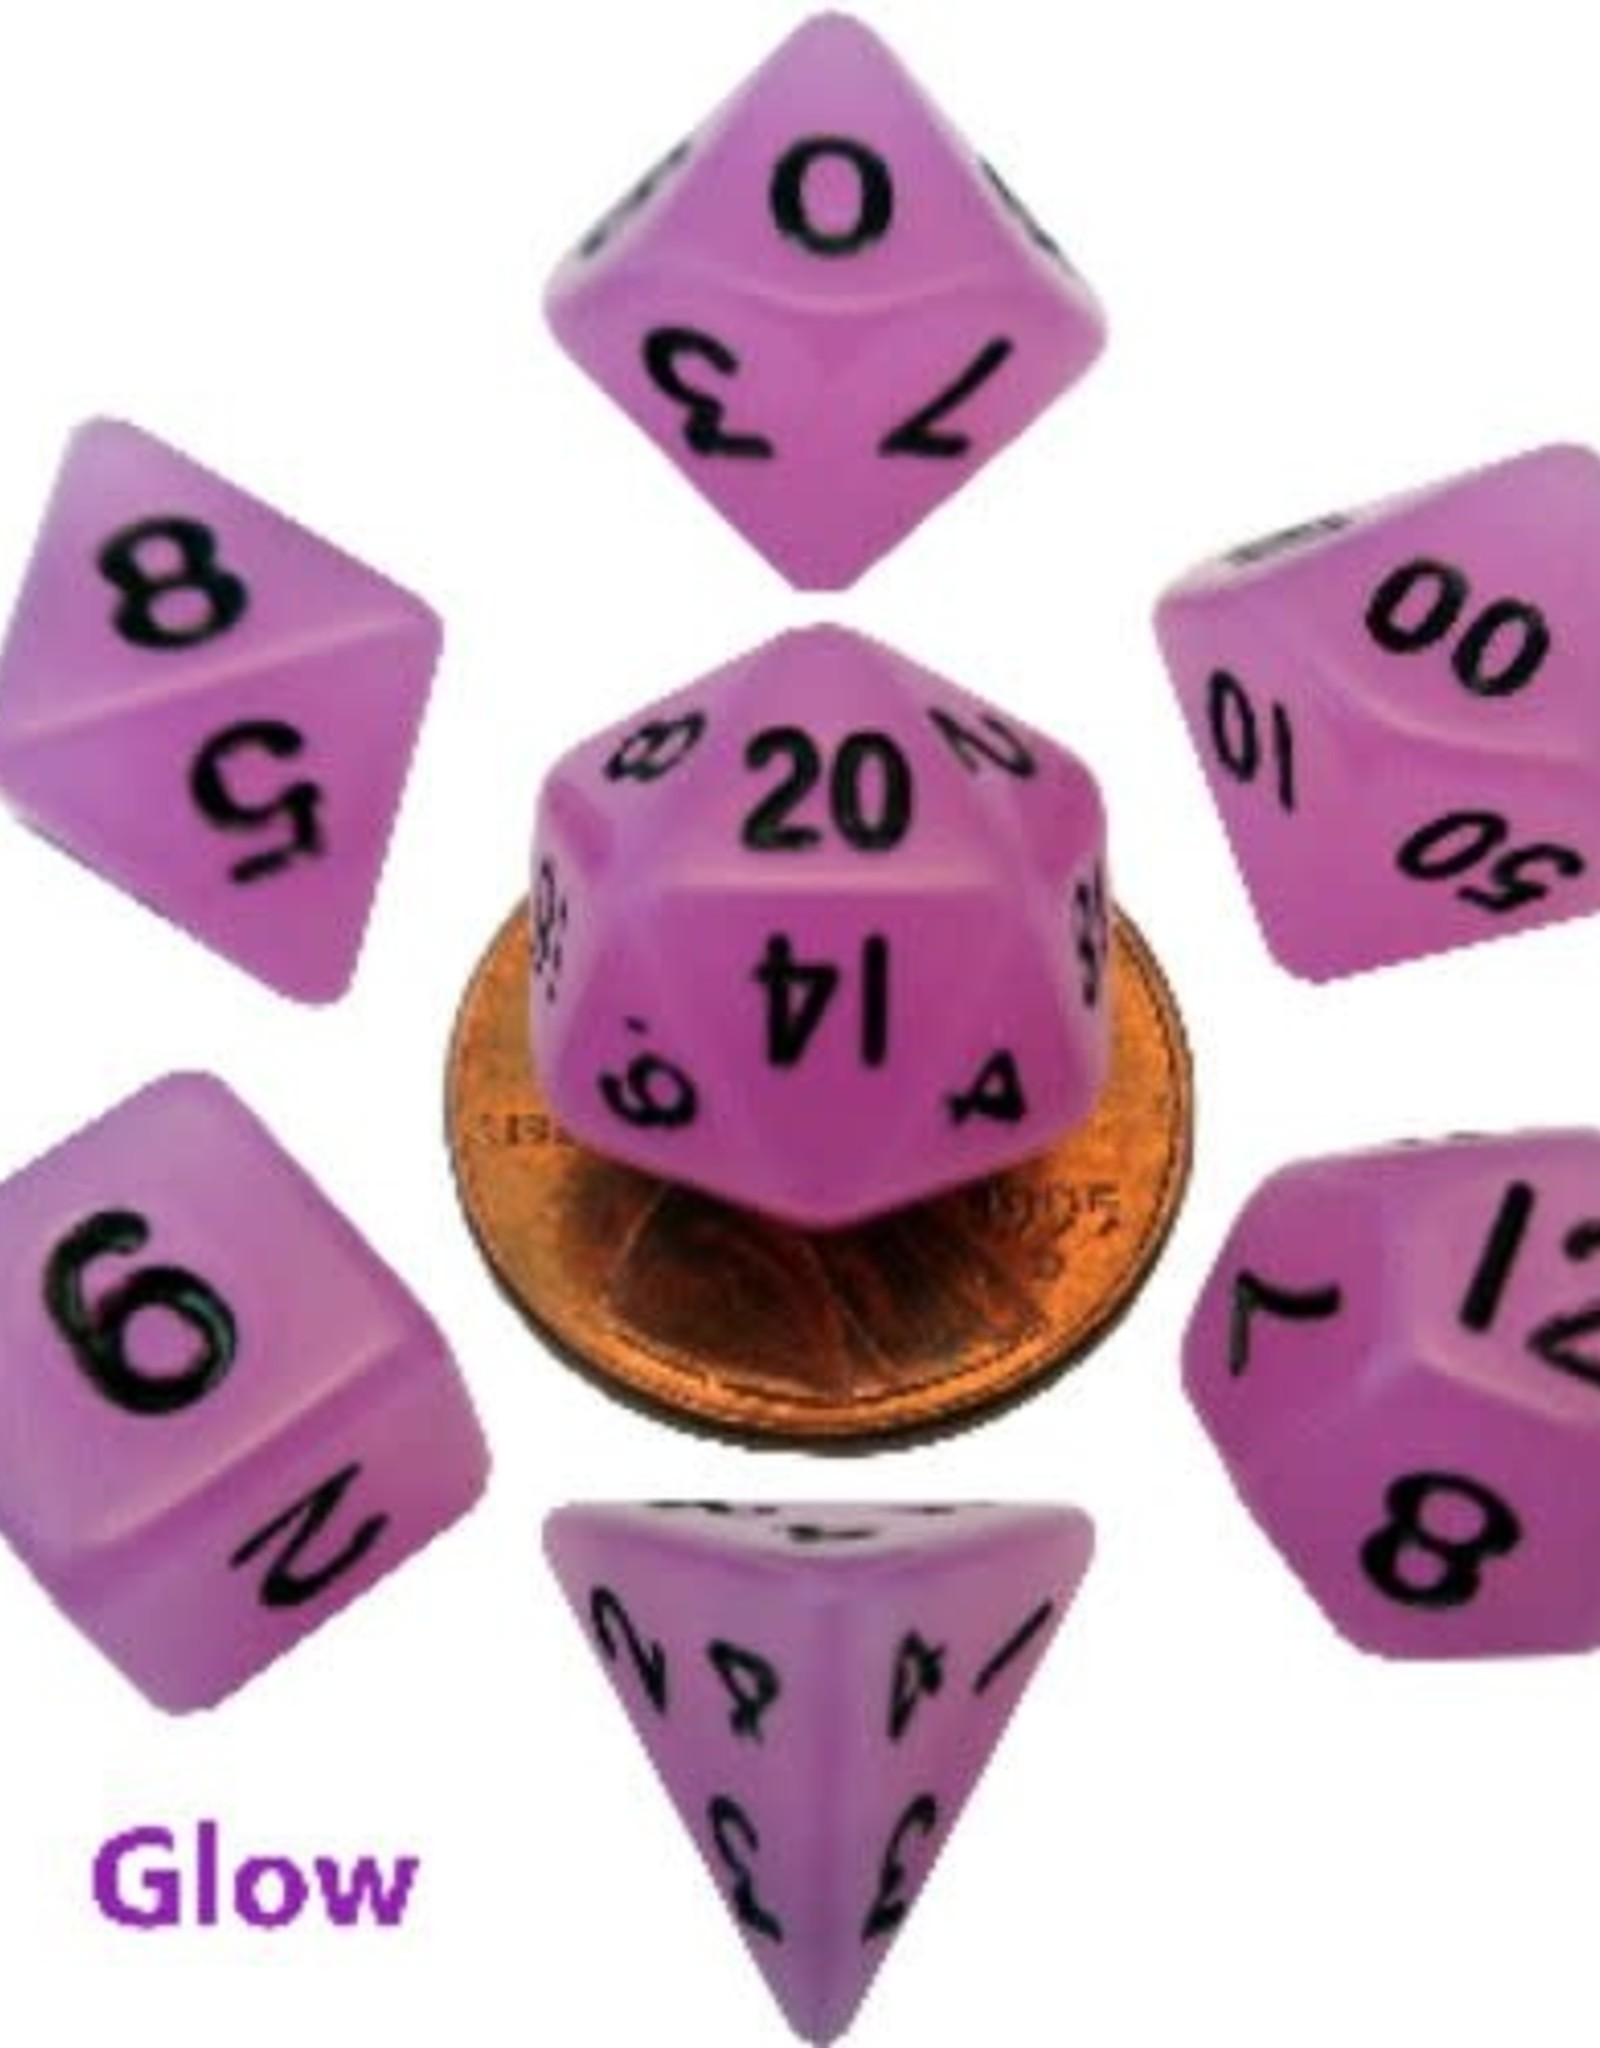 Metallic Dice Games 7 Count Mini Resin Glow Poly Dice Set, Purple